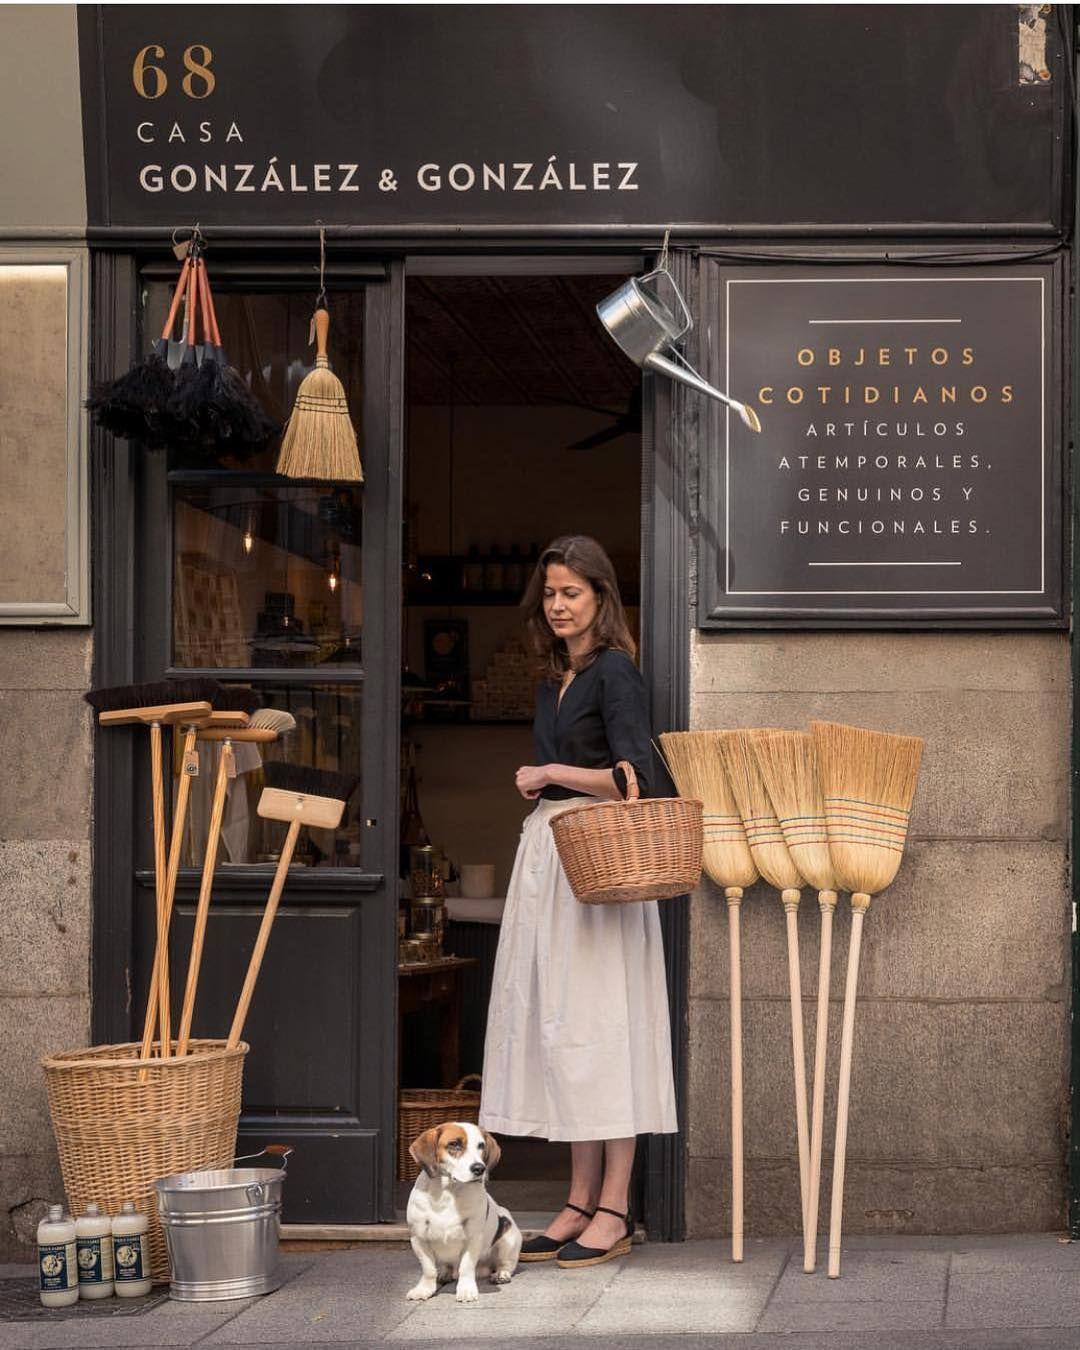 Casa González González Madrid Gonzalezygonzalezstore We Love This Shop That Maria Rosa Javier Have Created Which Specia Tiendas Colores Disenos De Unas